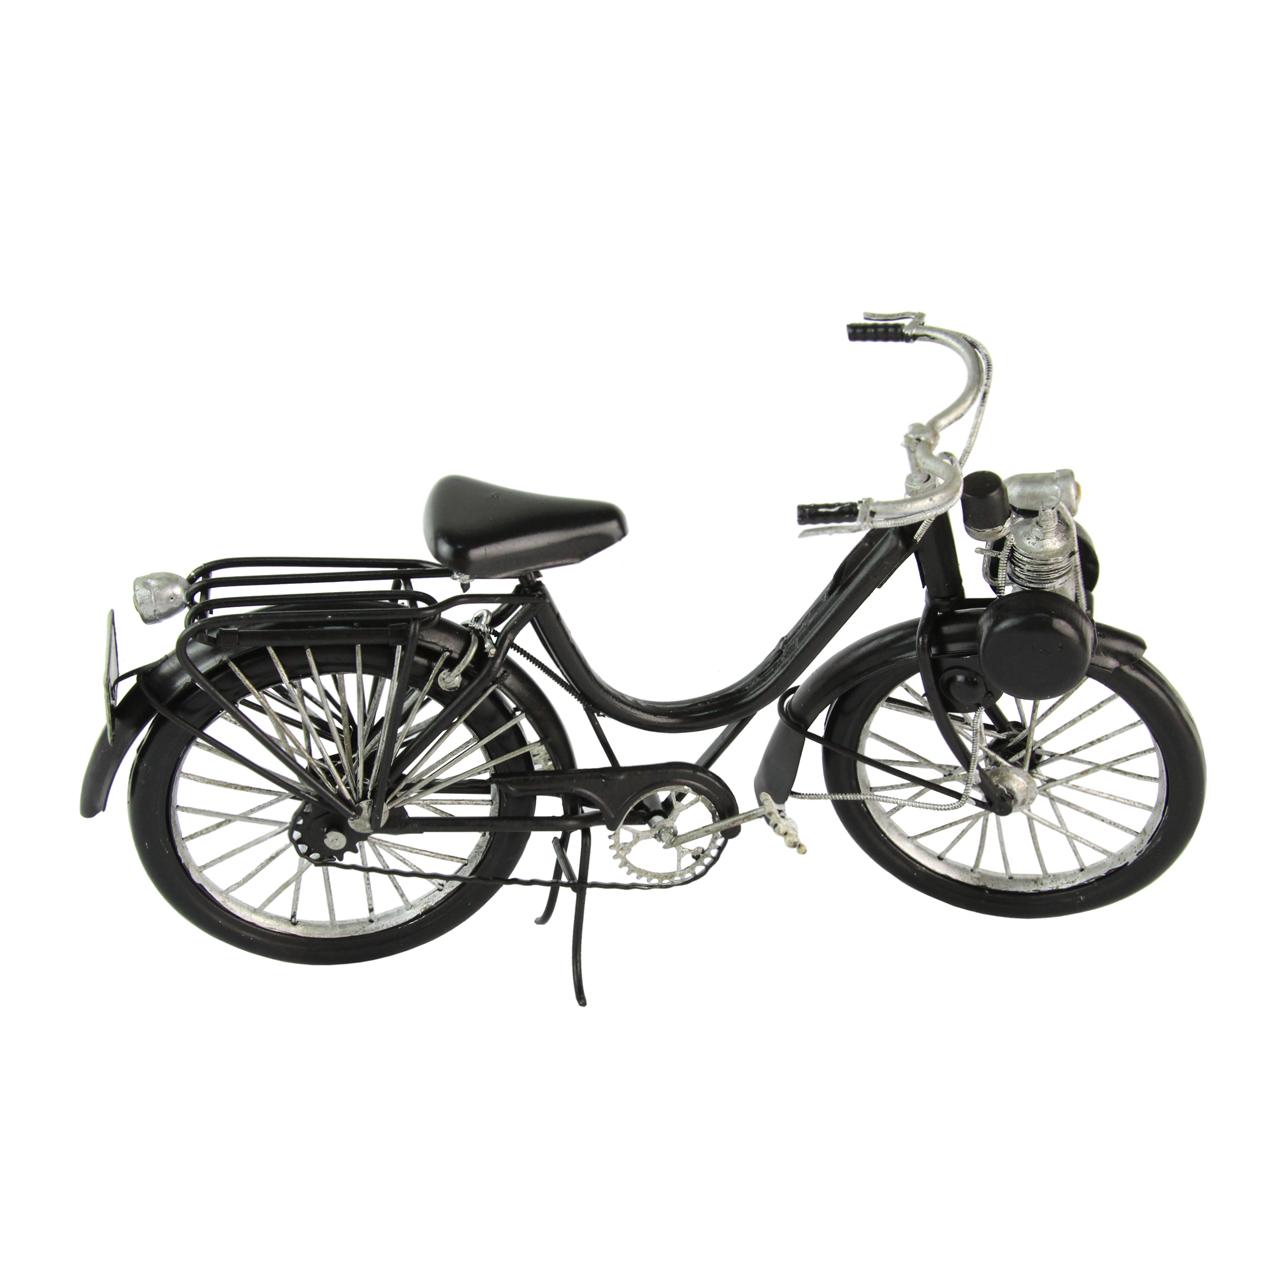 Macheta Bicicleta Din Metal Negru 27 Cm